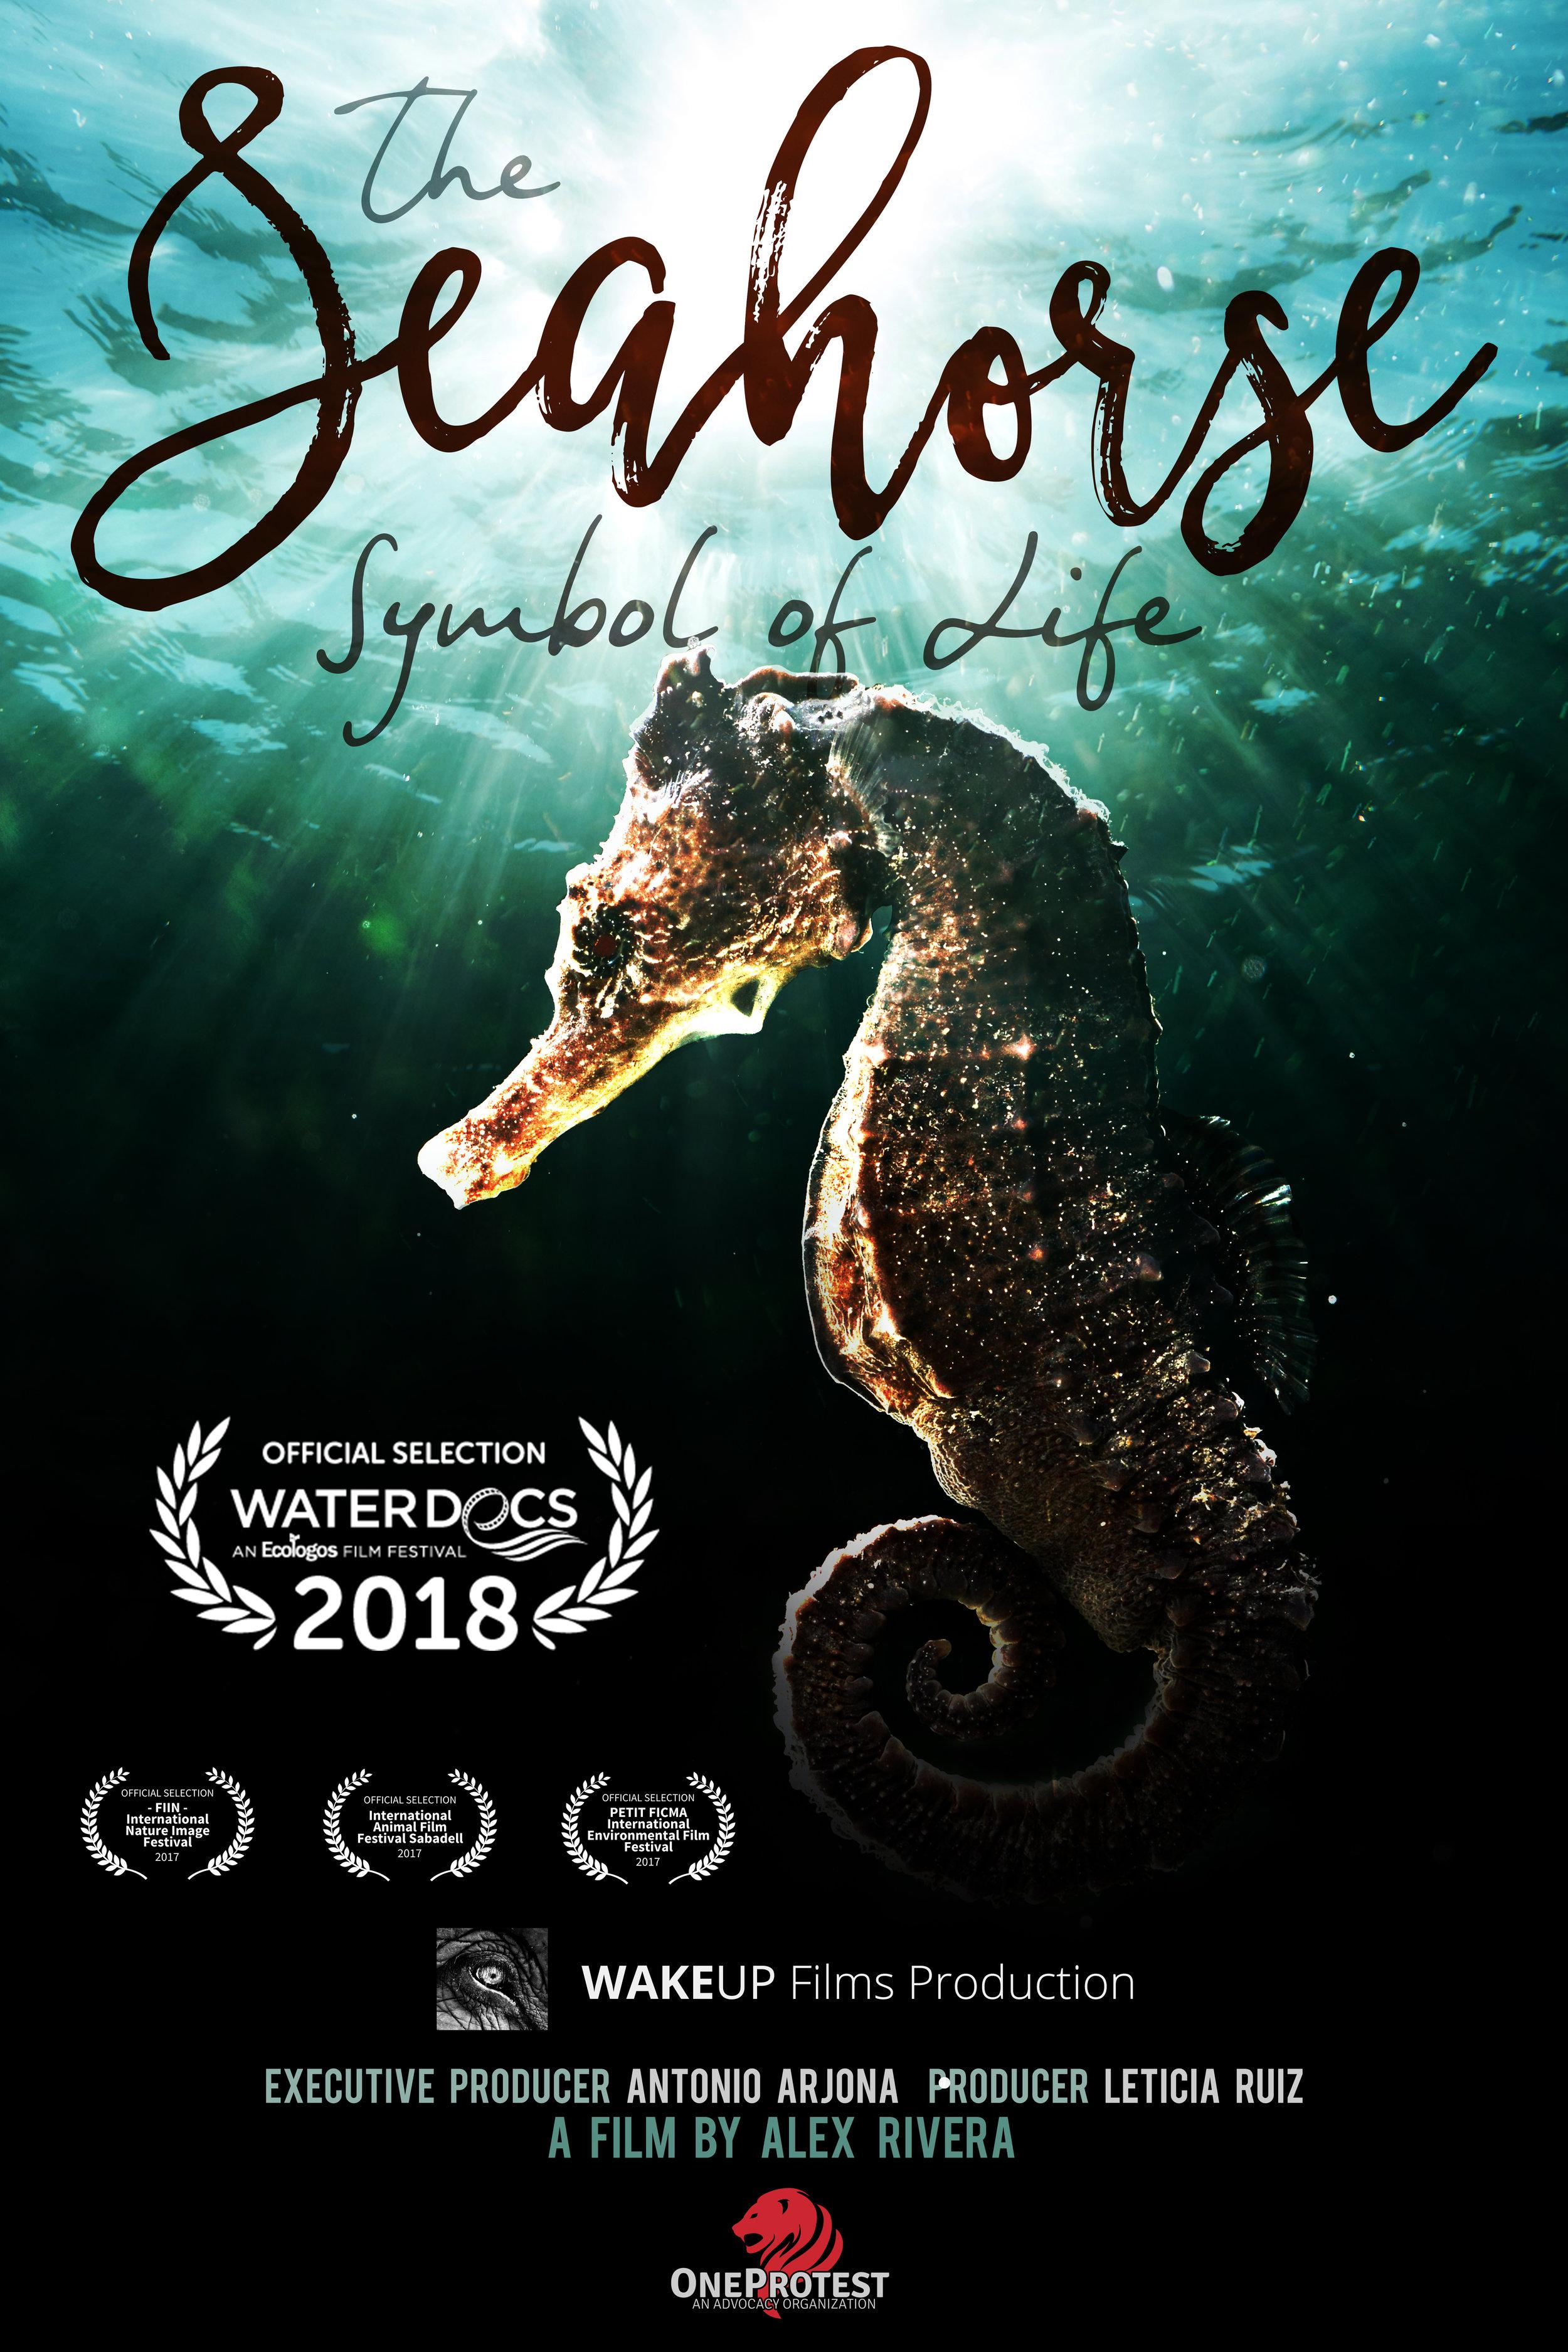 Poster-The Seahorse_Symbol of life_WaterDocs.jpg